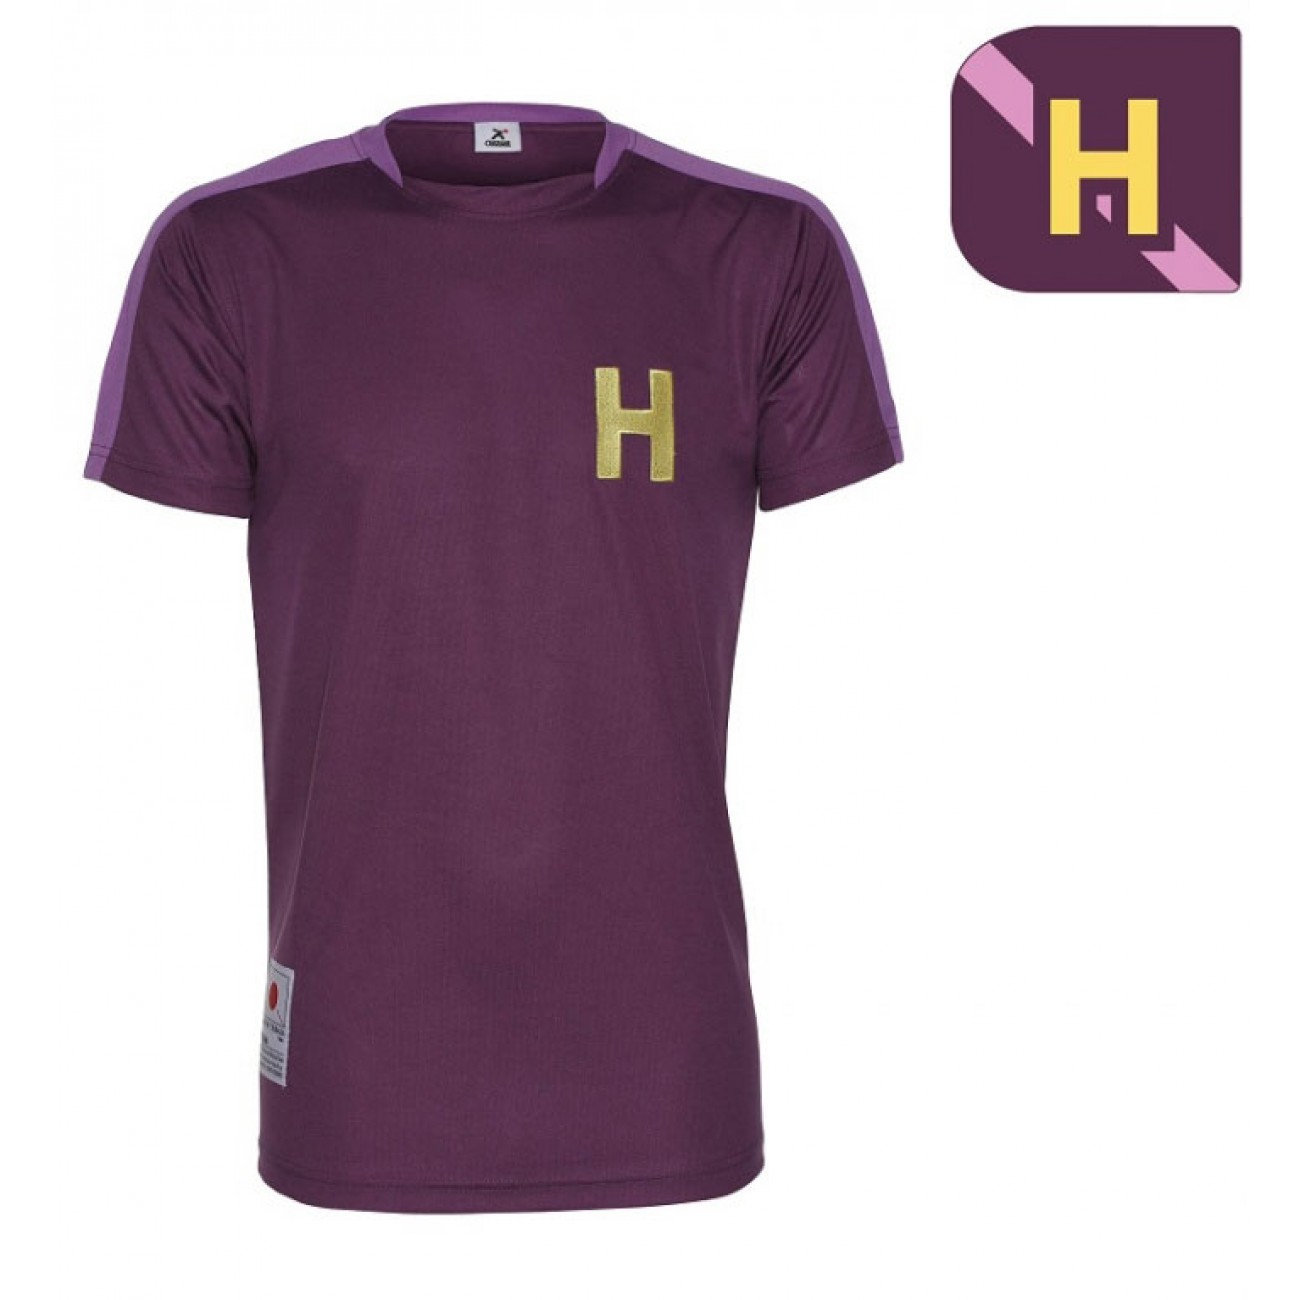 http://www.retrofootball.es/ropa-de-futbol/camiseta-hanawa-hermanos-tachibana.html